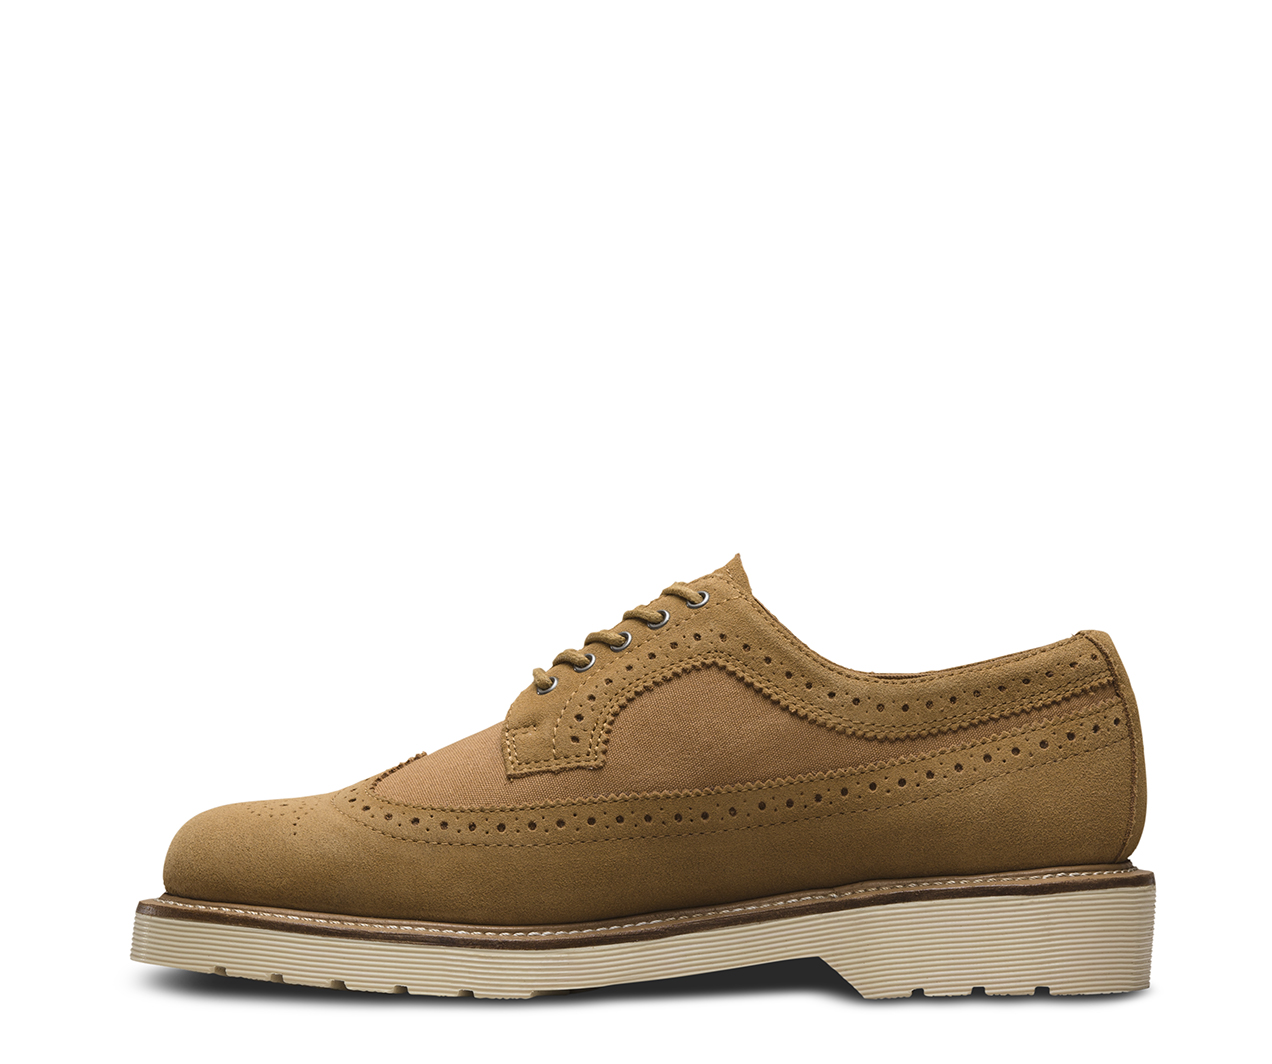 Dr. Martens 3989 Chestnut Suede Wp & Chestnut Canvas 22193231, Zapatos - 42 EU